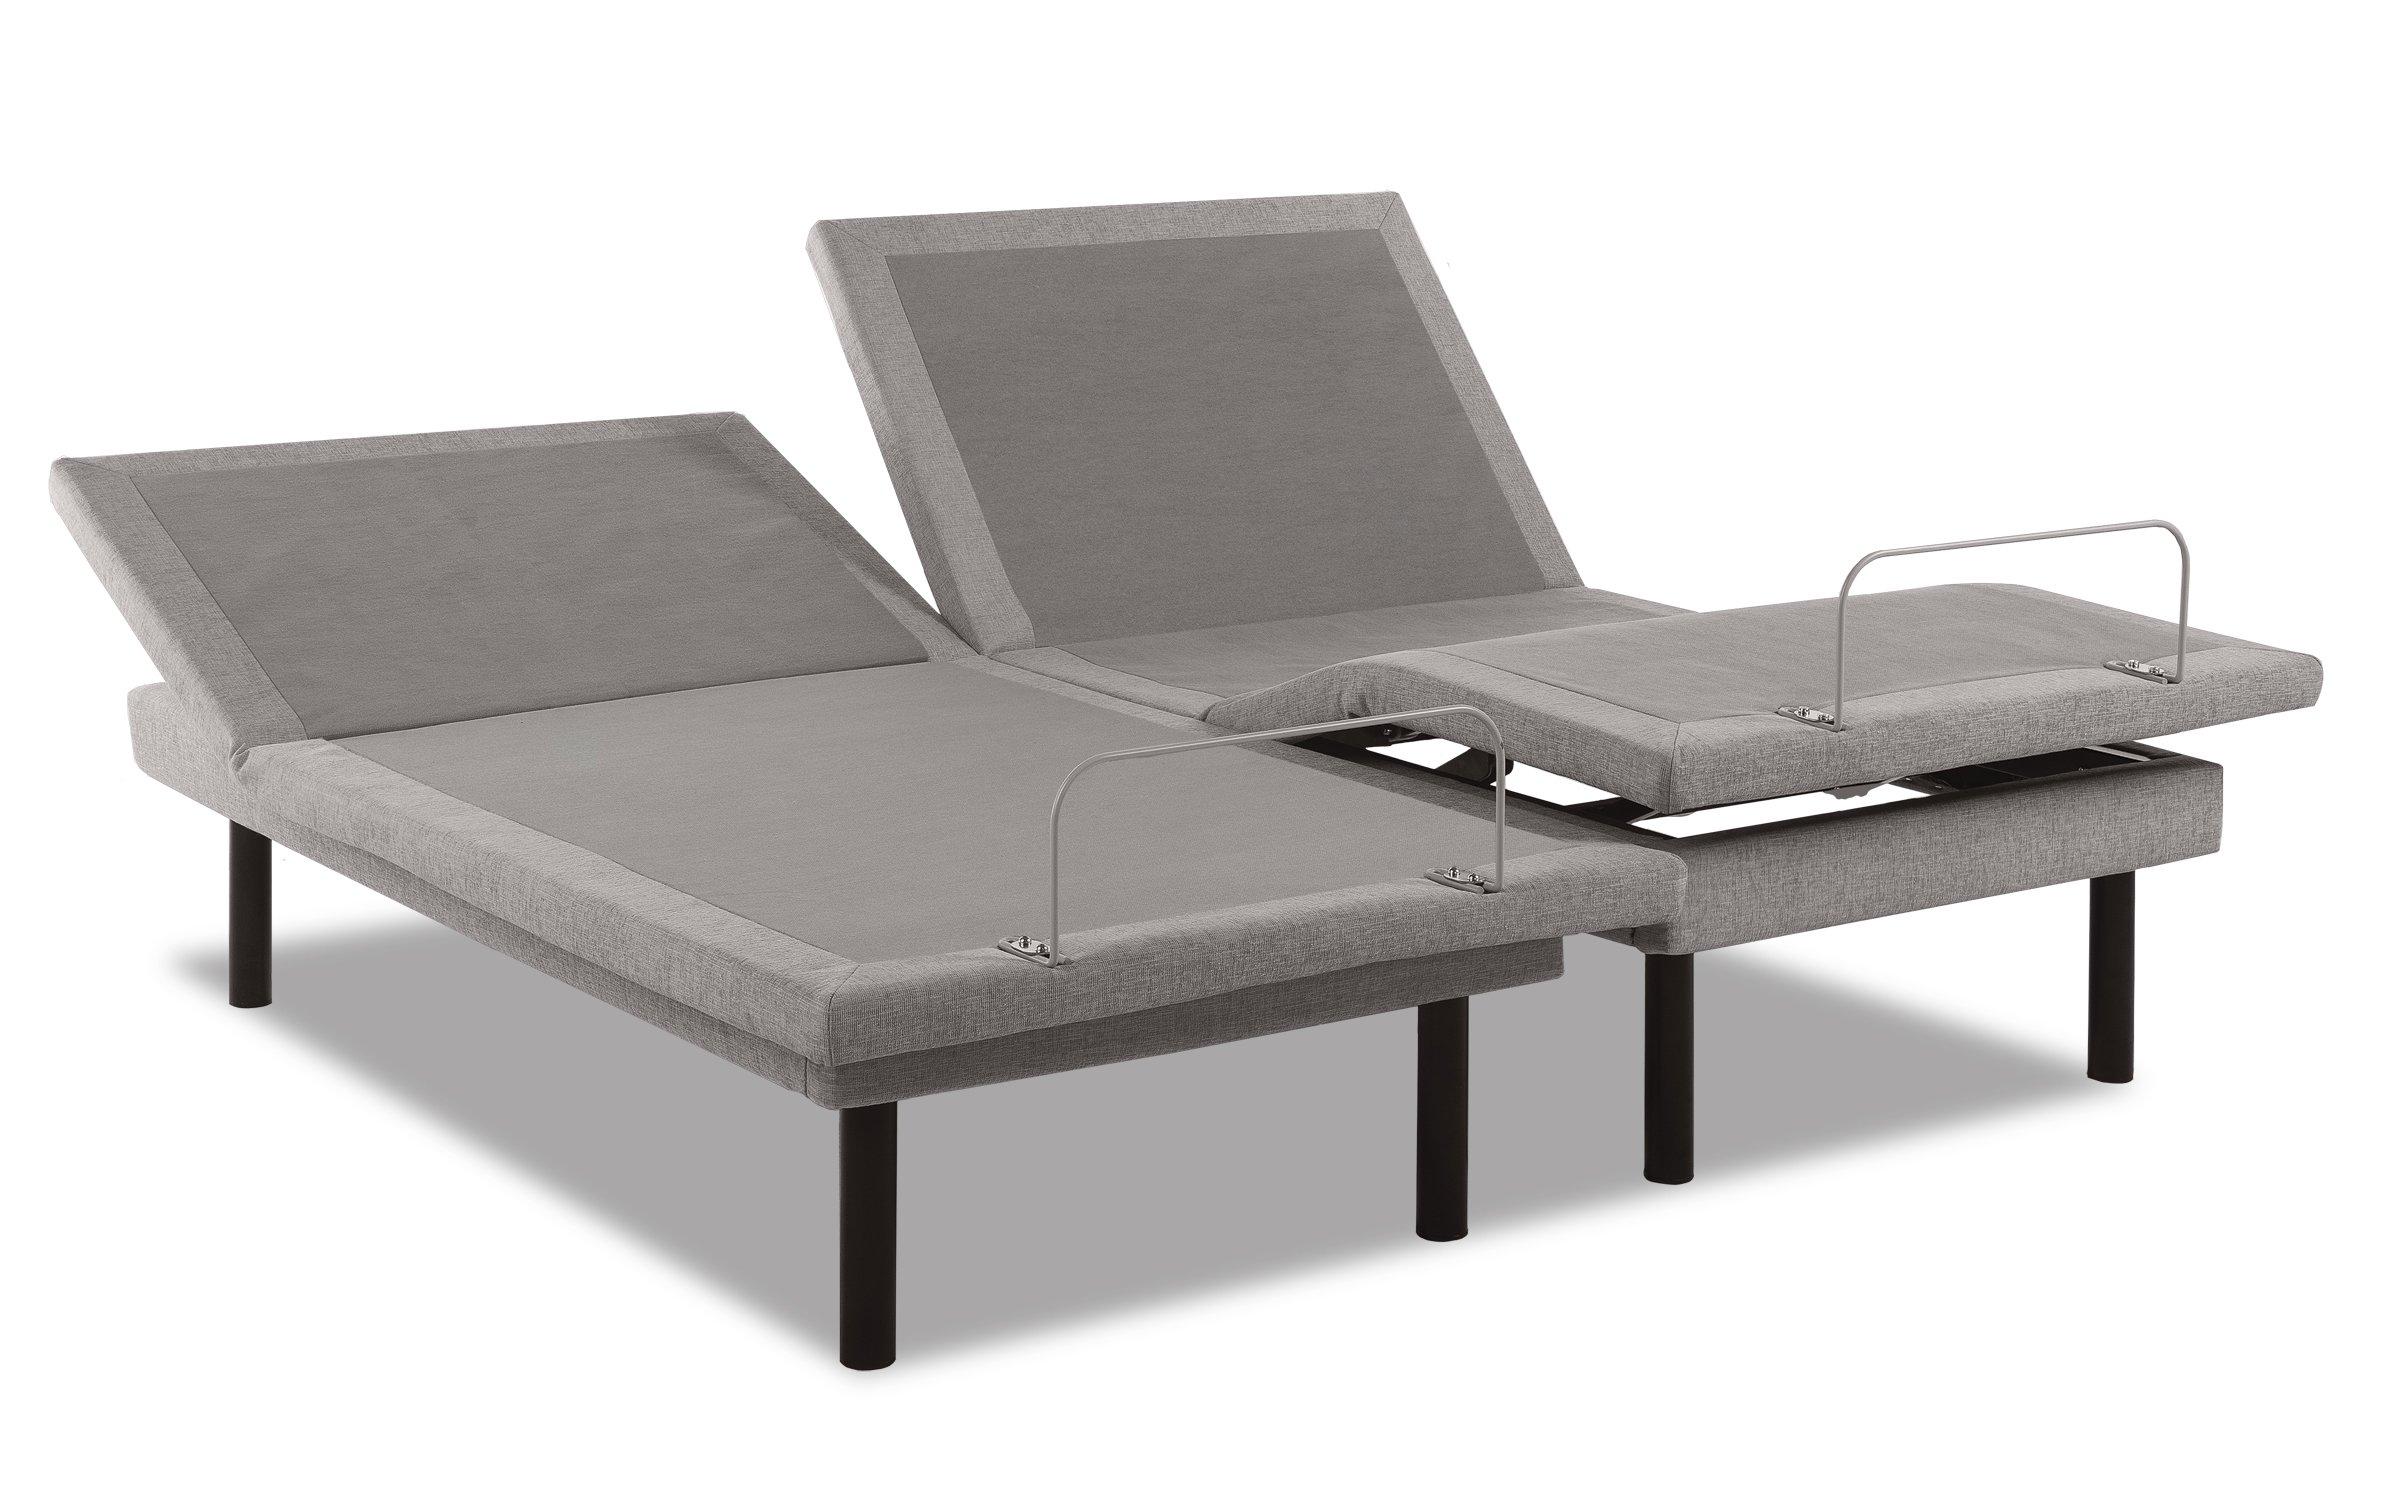 TEMPUR-Ergo Plus-Grey Adjustable Base, Twin XL by Tempur-Pedic